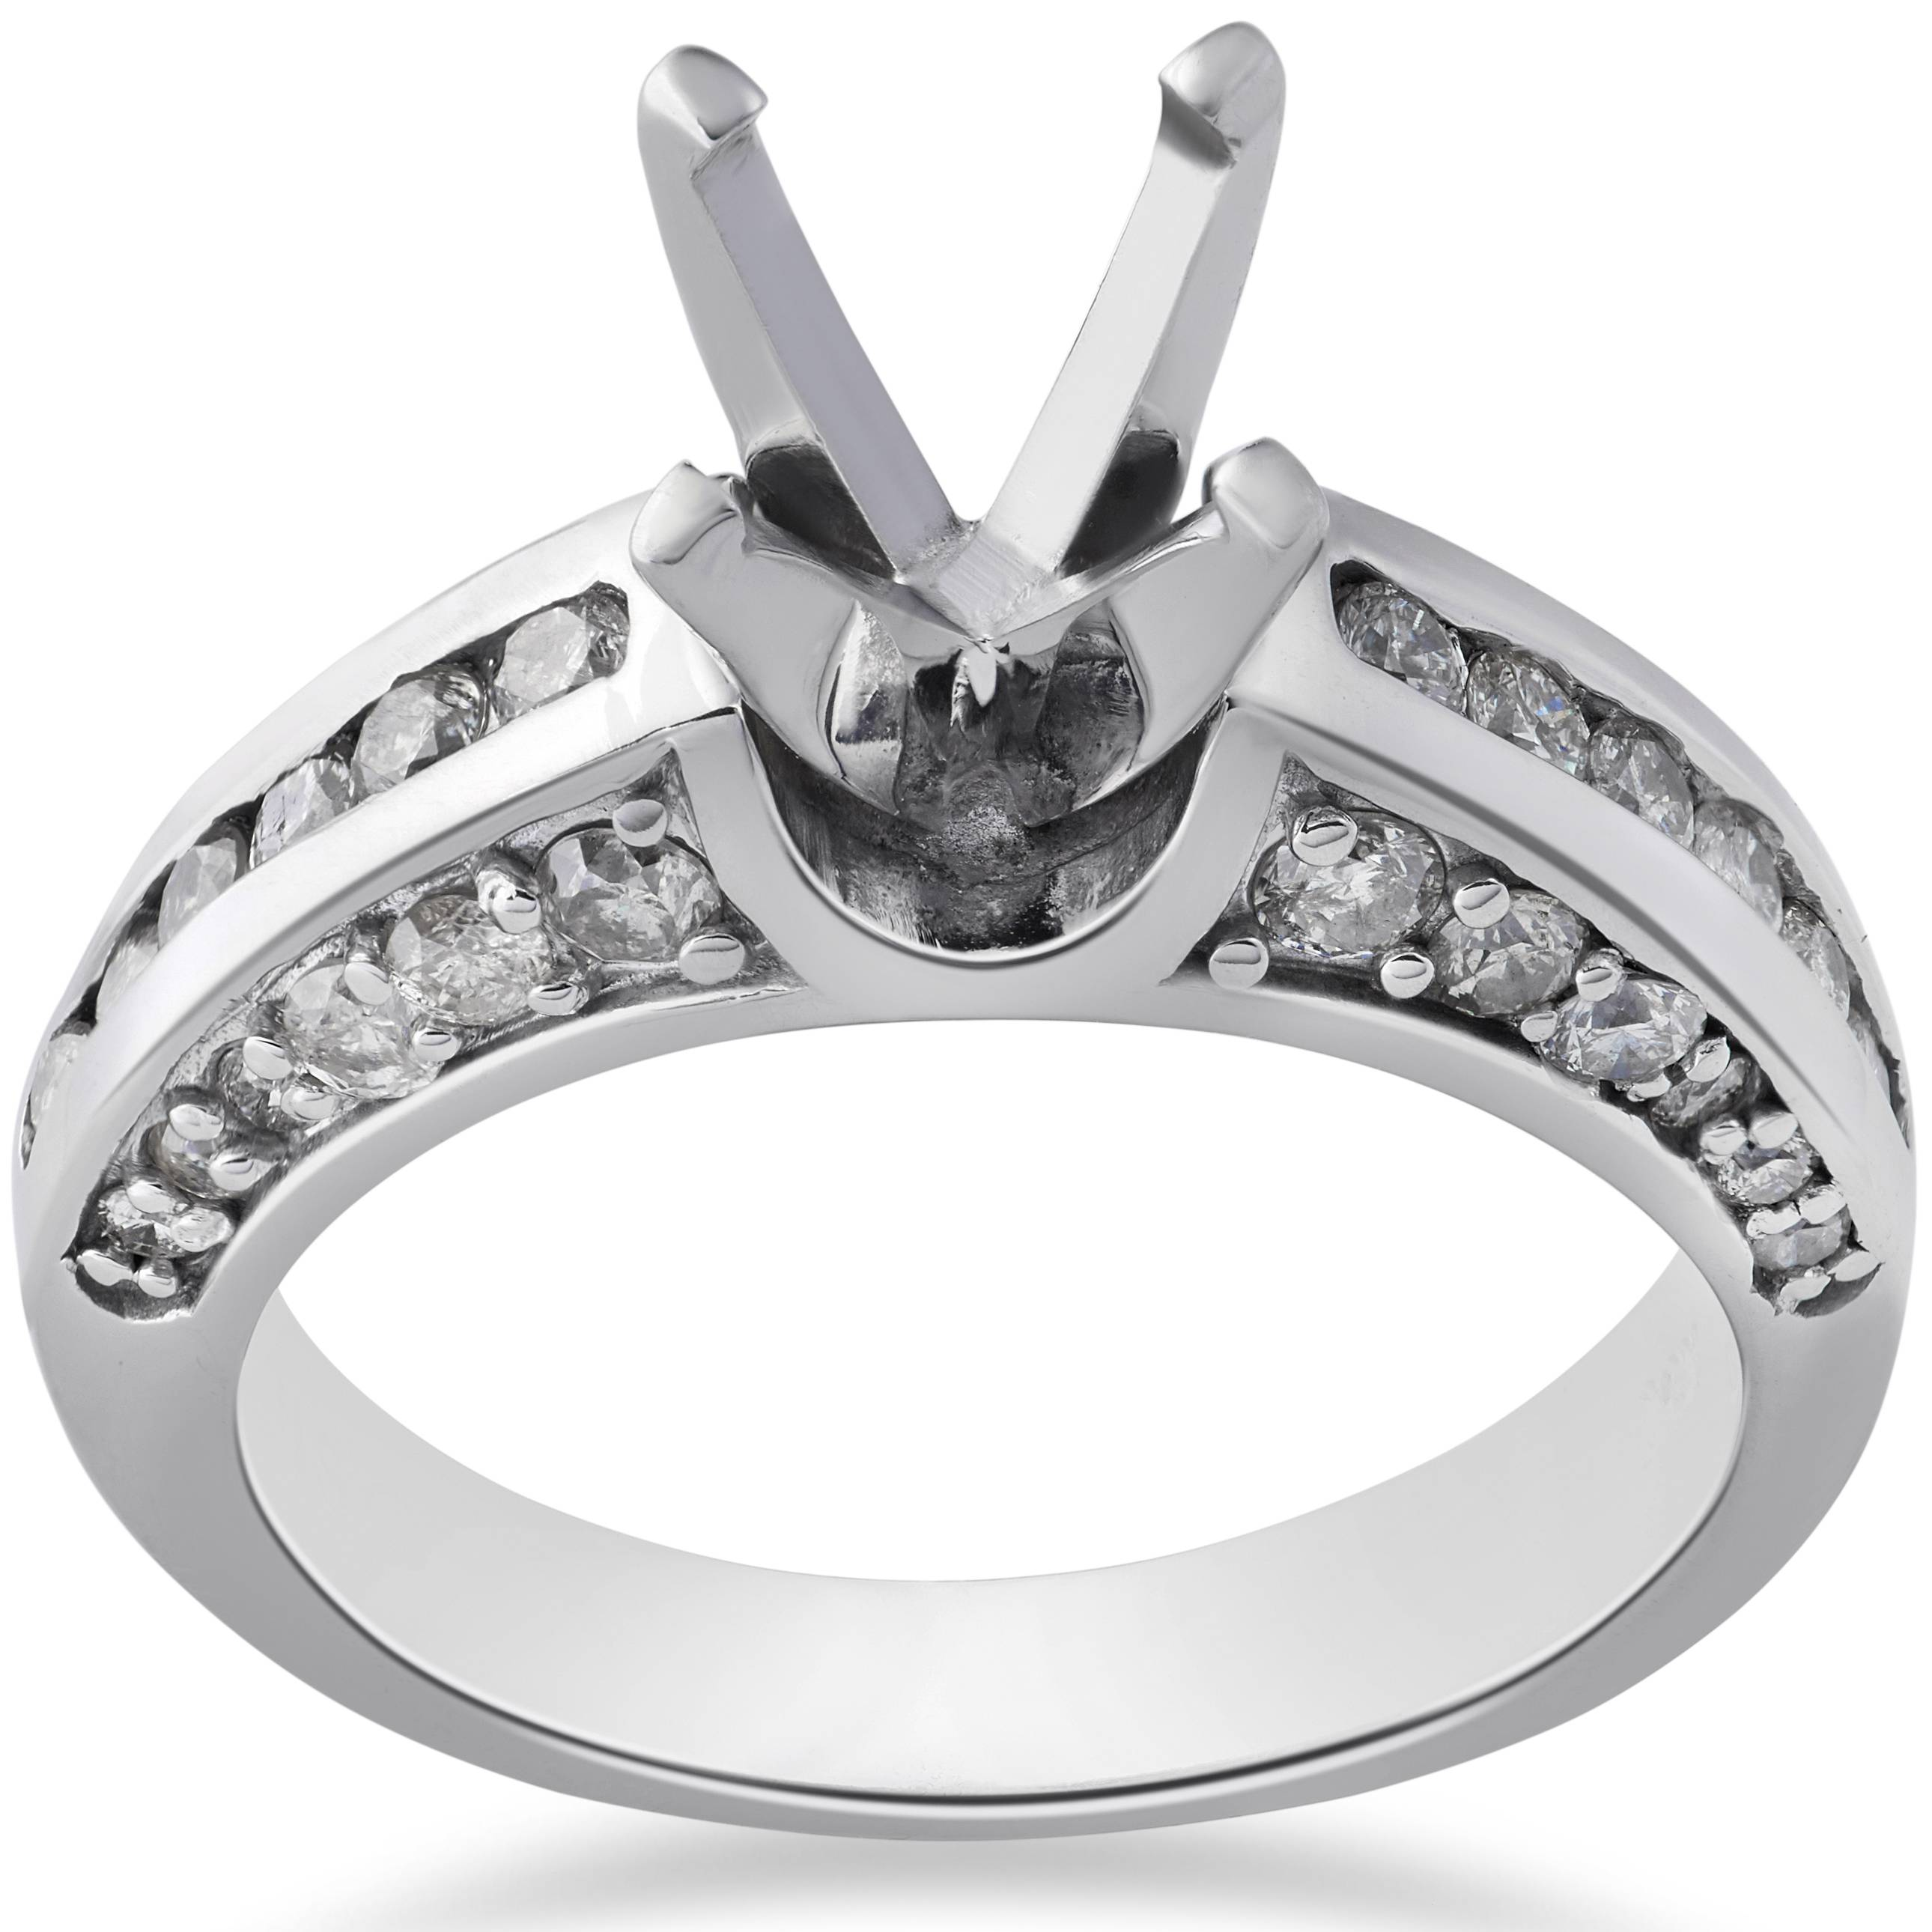 Diamond Engagement Ring Setting 1 Carat 14k White Gold. Religious Rings. Mobius Wedding Rings. Glass Breaking Wedding Rings. Or Paz Rings. Nose Wedding Rings. Kiran Name Wedding Rings. 18th Century Rings. Phd Rings